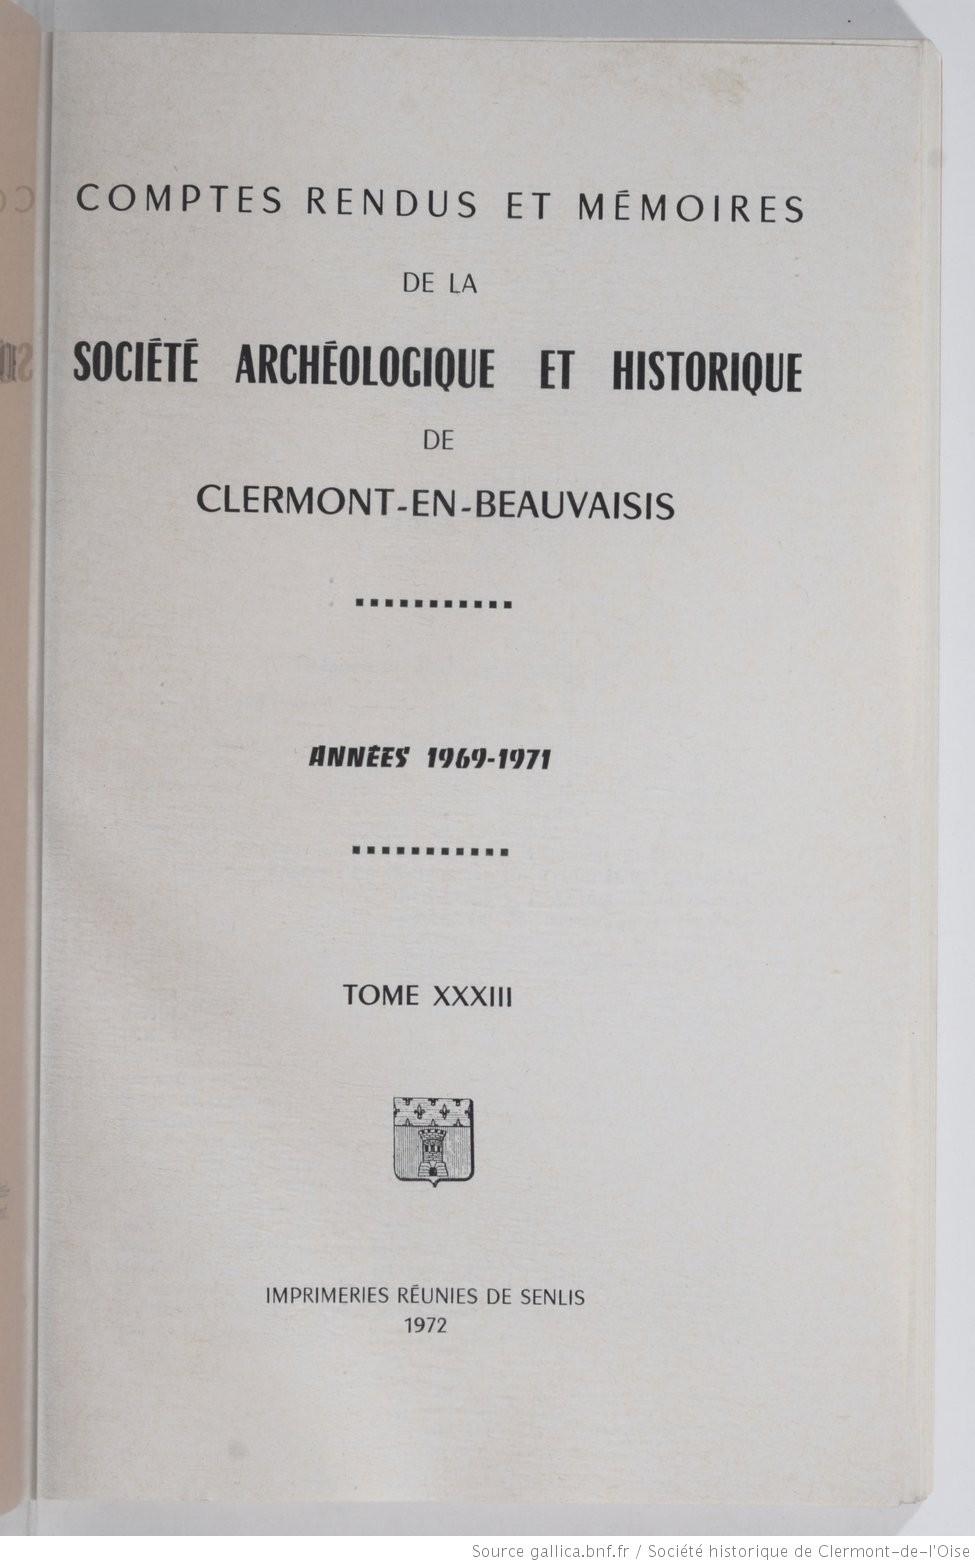 https://gallica.bnf.fr/ark:/12148/bpt6k6490514d.highres.jpg